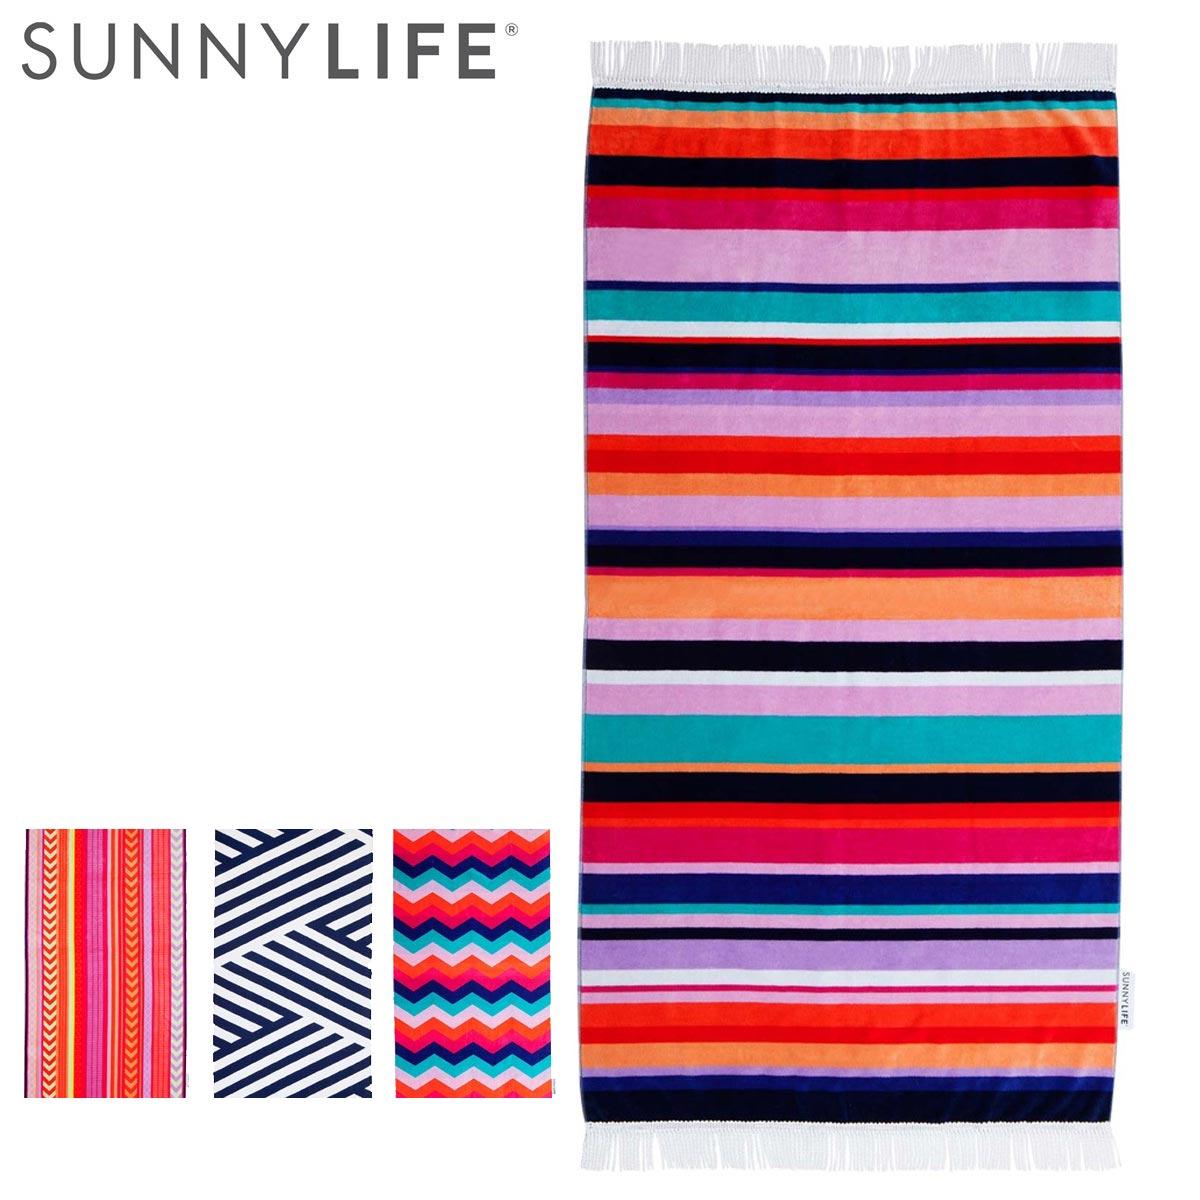 Allsports Sunny Life Sunnylife Beach Towel Bath Towel Towelling